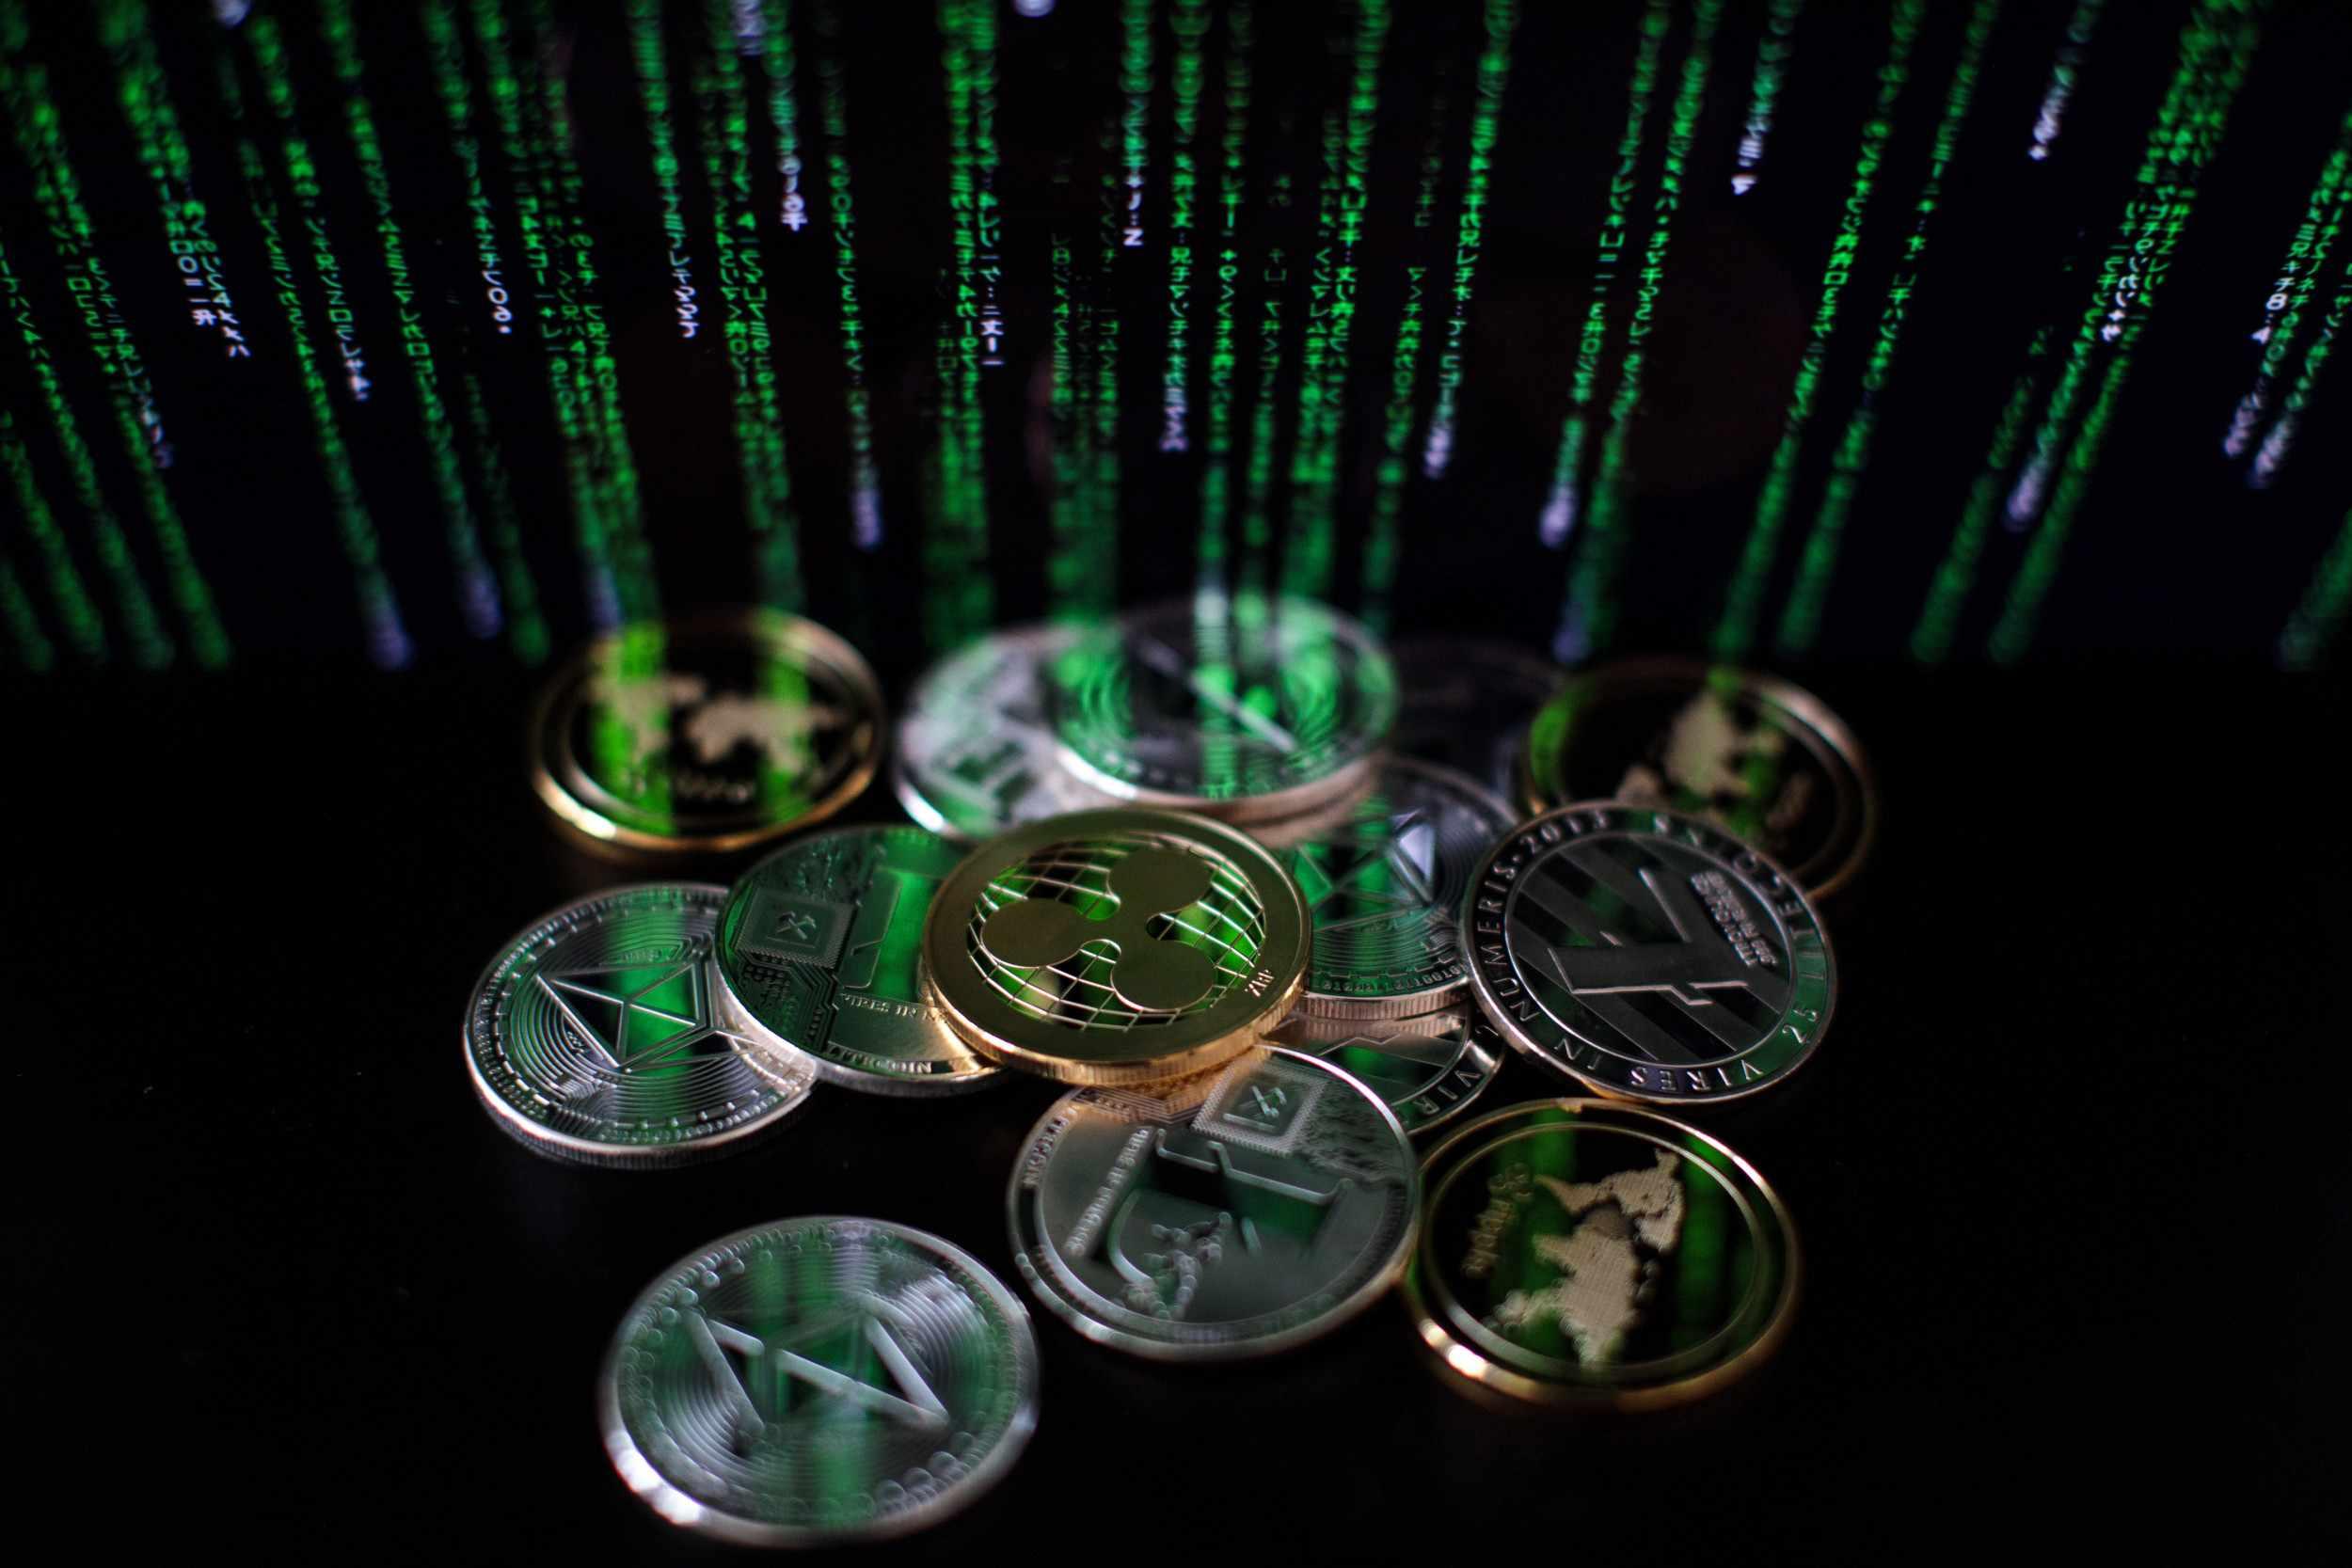 cryptocurrency market investors decentralized cryptocurrencies